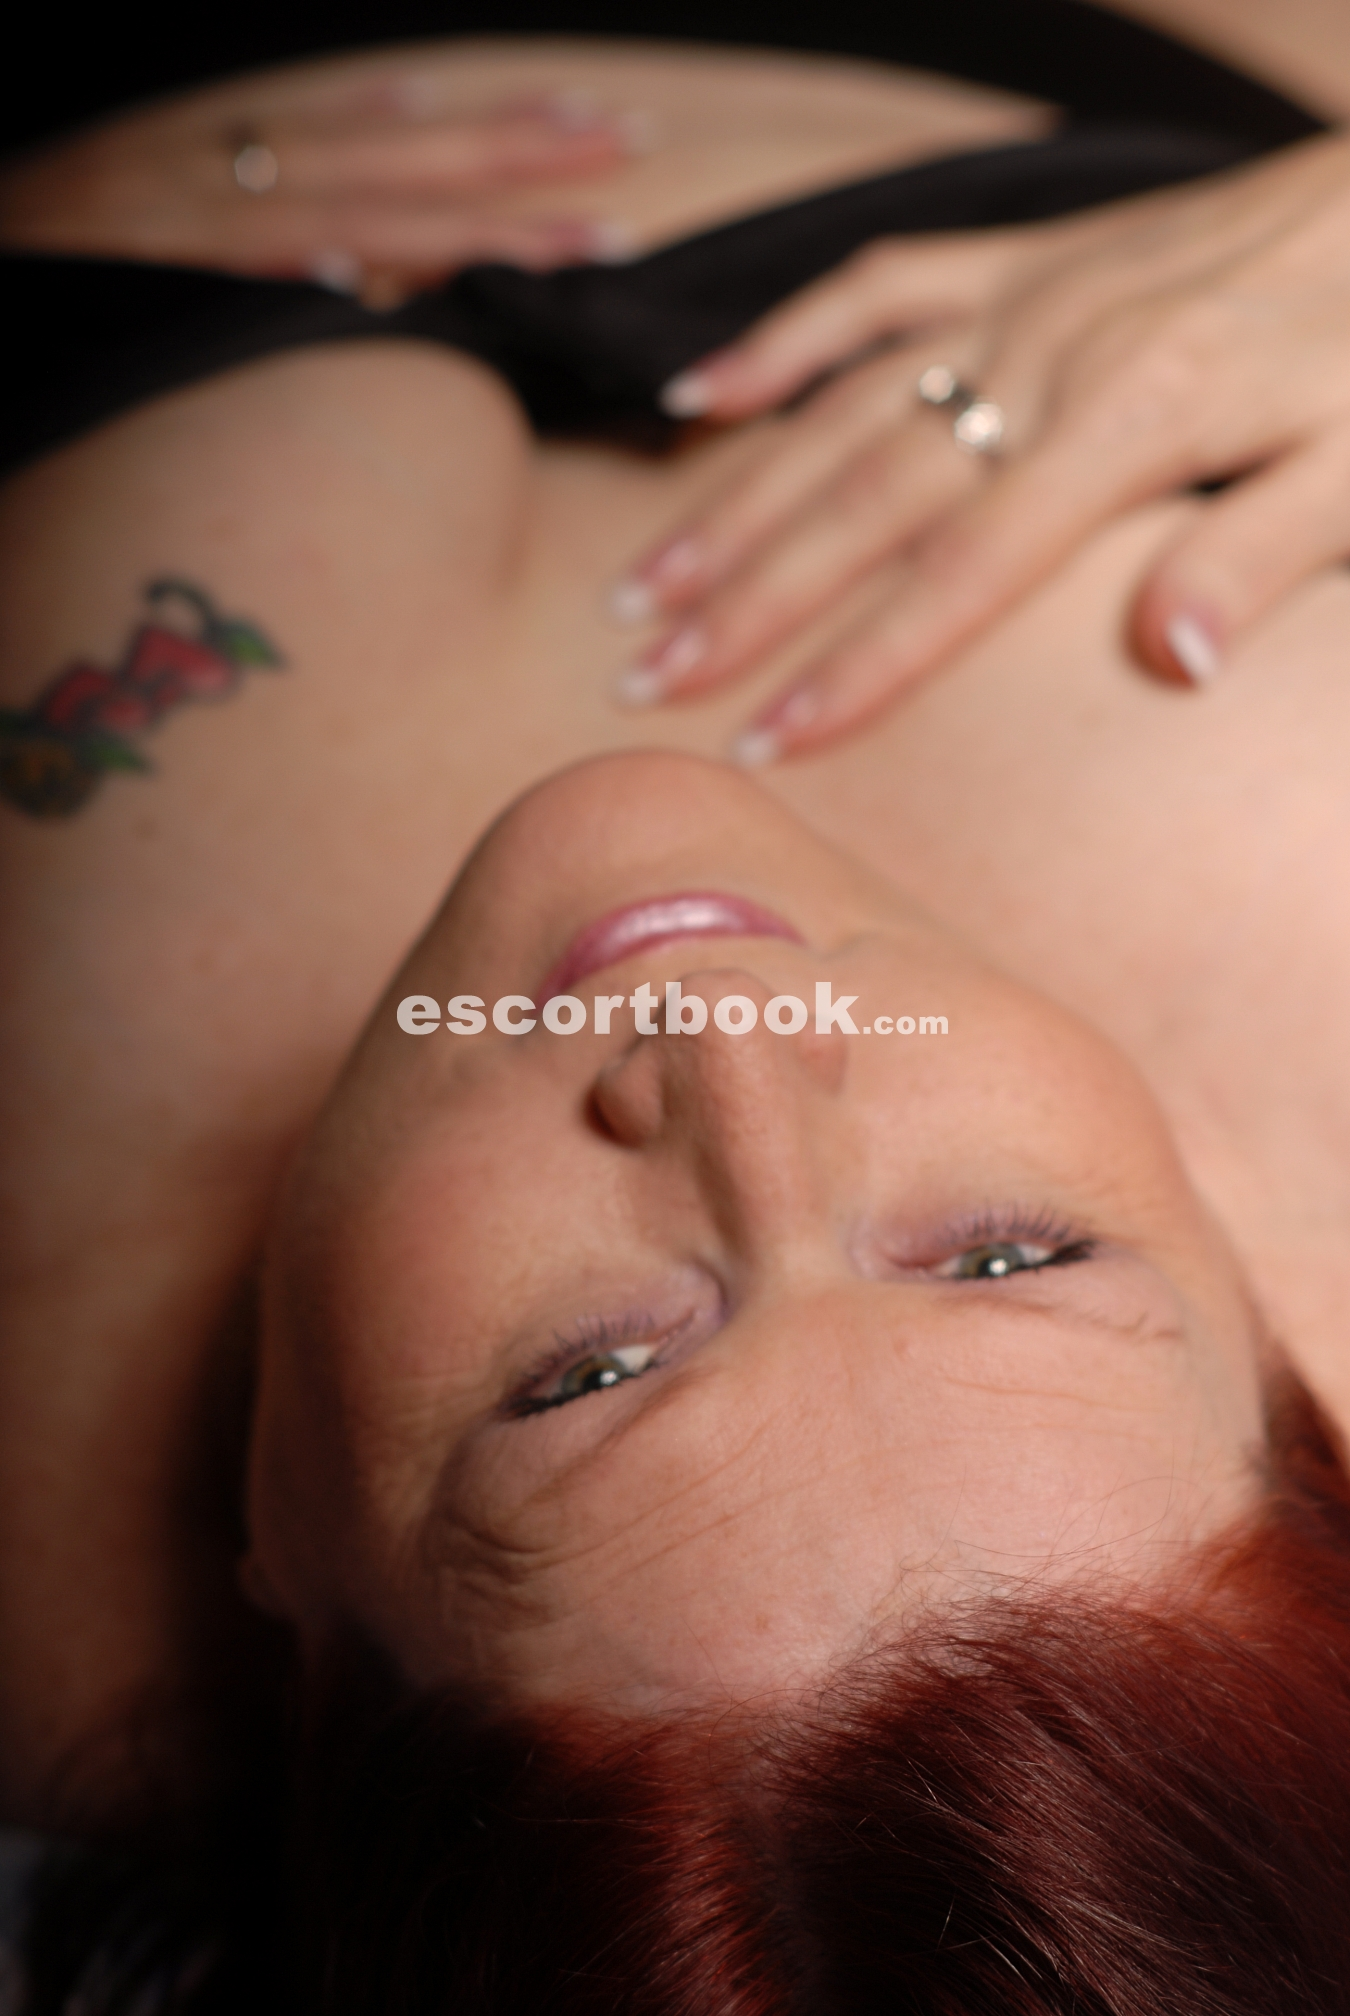 Escorts lubbock Lubbock - WikiSexGuide - International World Sex Guide